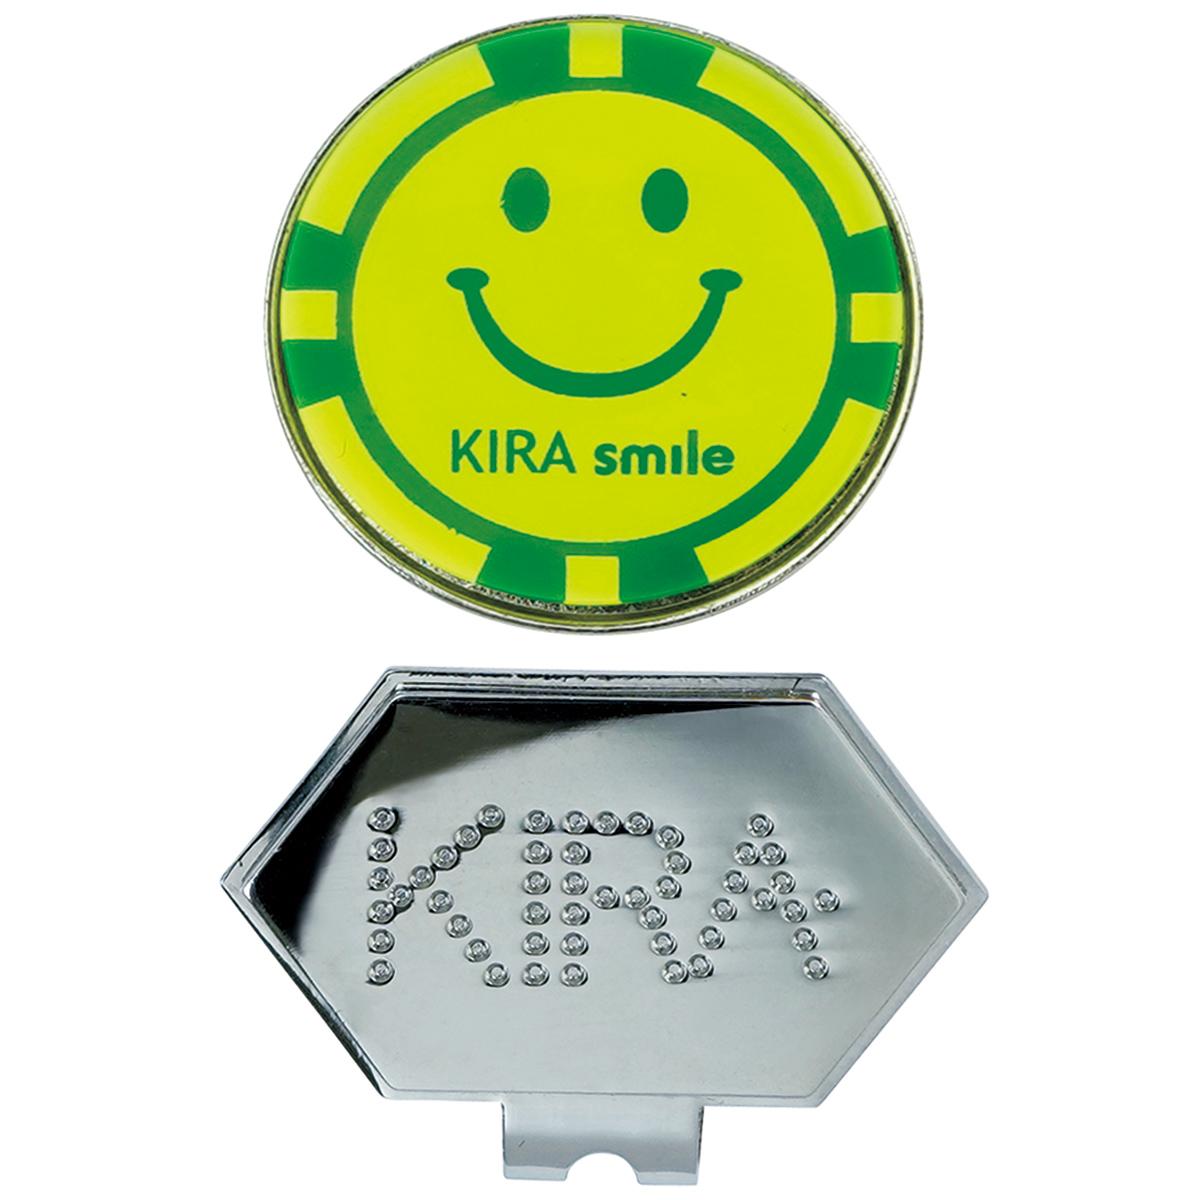 KIRA Smile クリップ&集光性マーカー